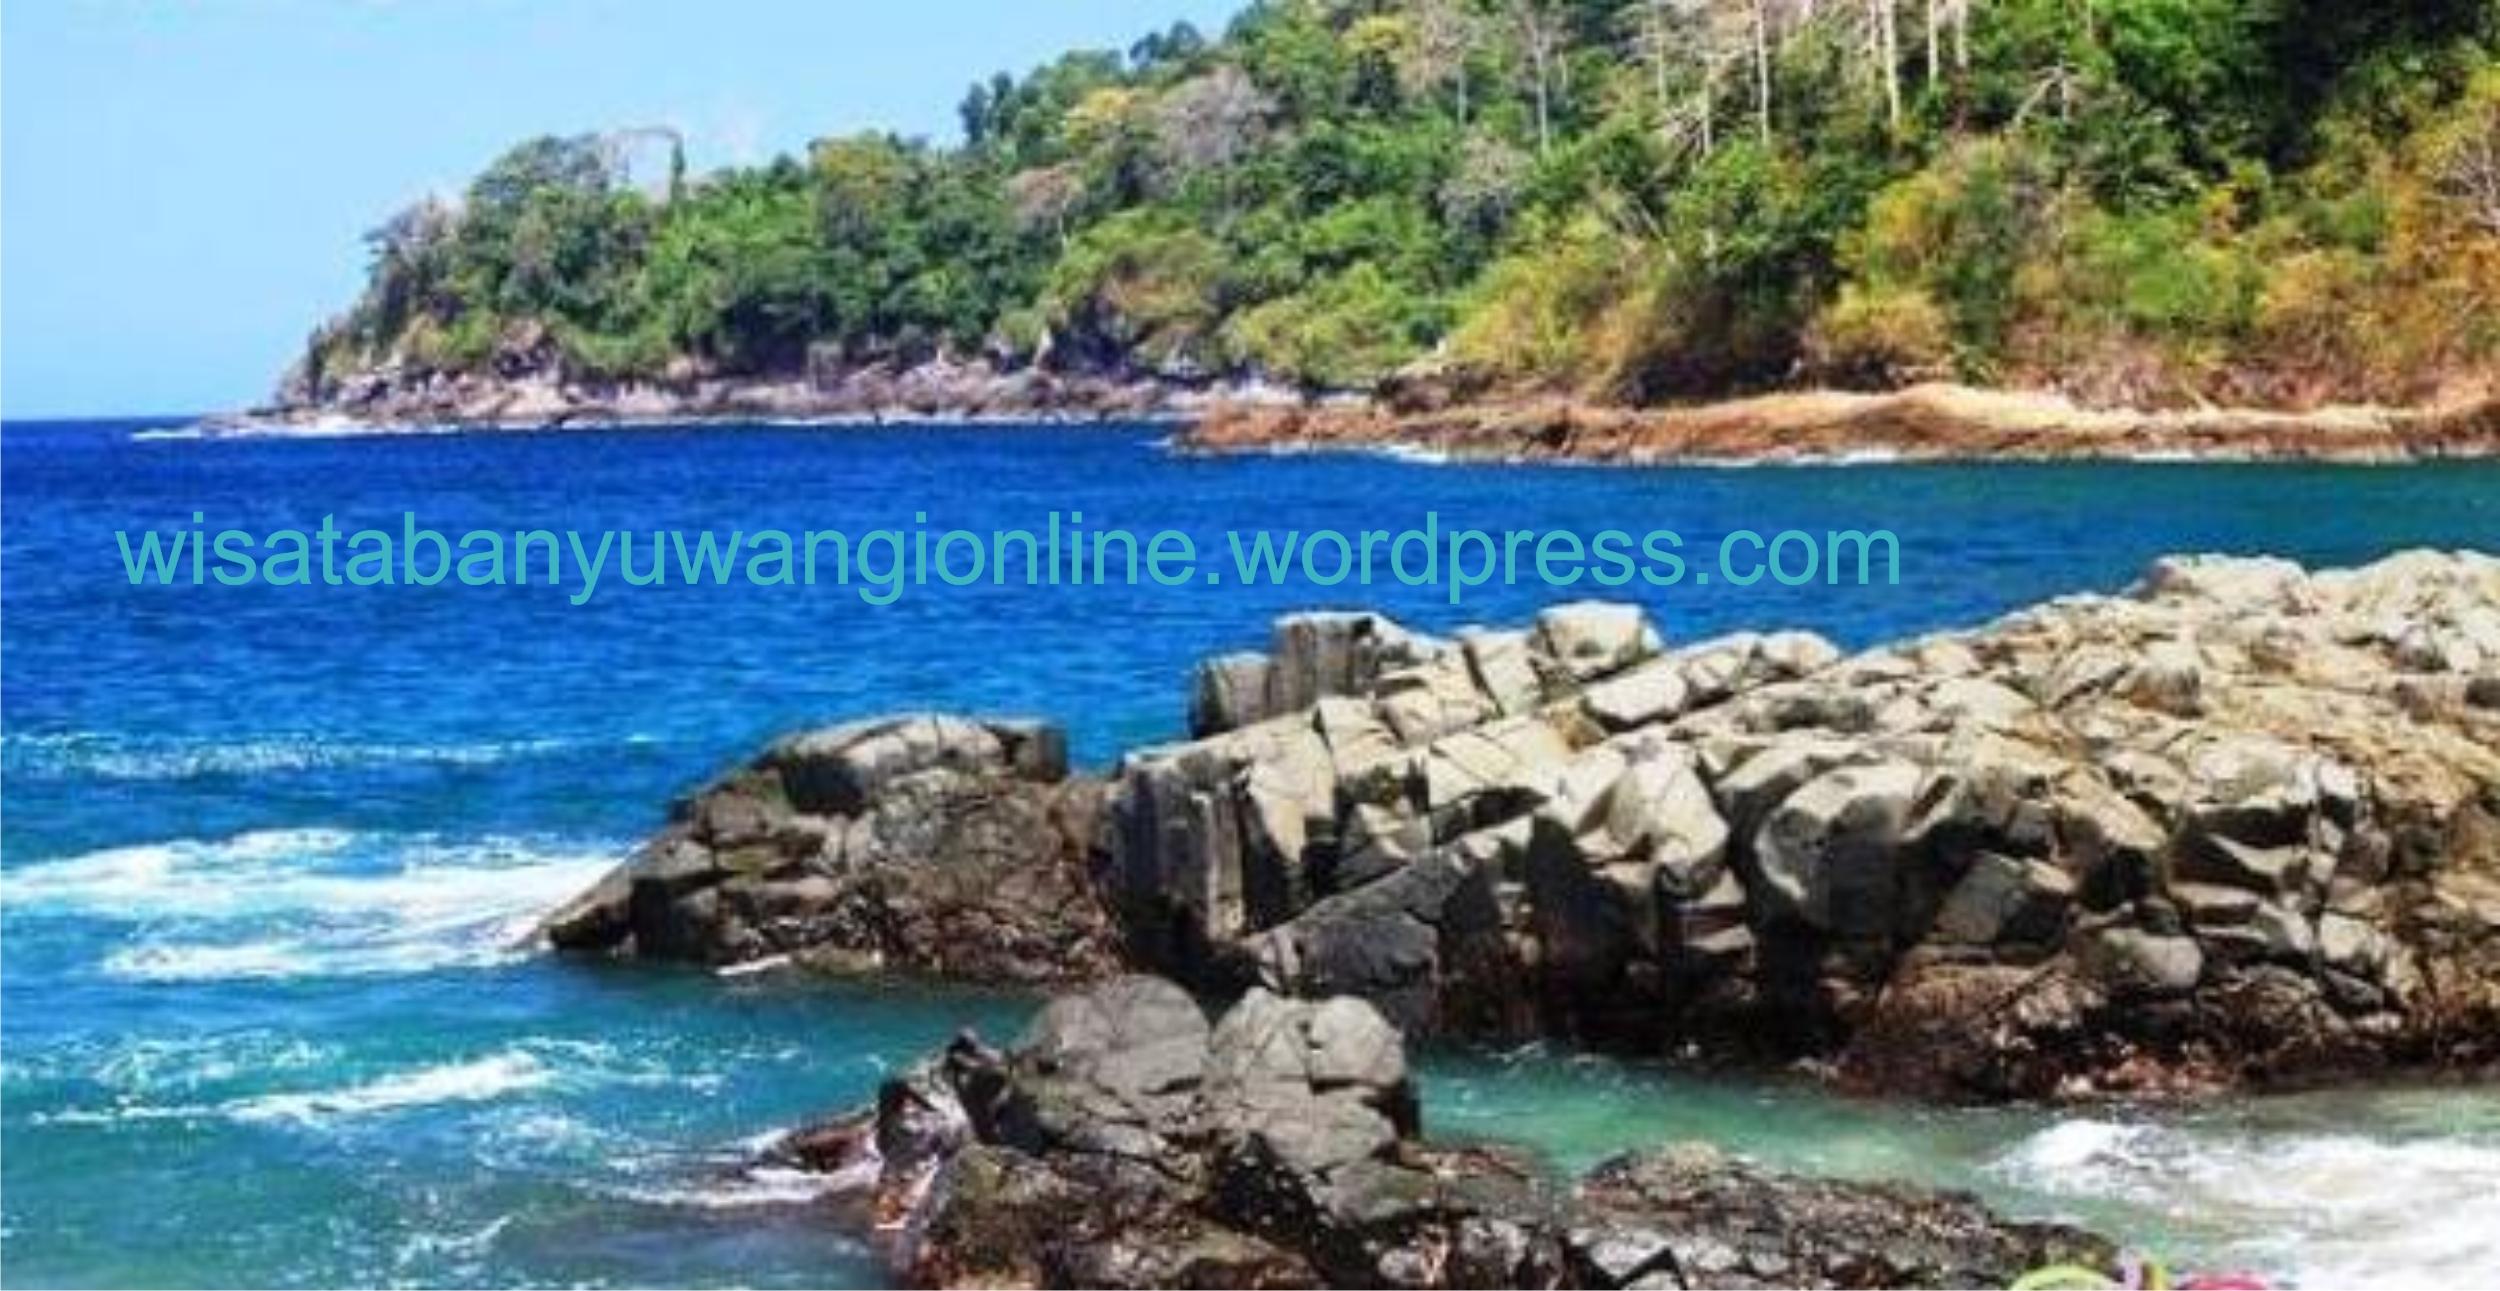 Wisata Alam Banyuwangi Wisatabanyuwangionline Pantai Rajek Wesi Lampon Kab